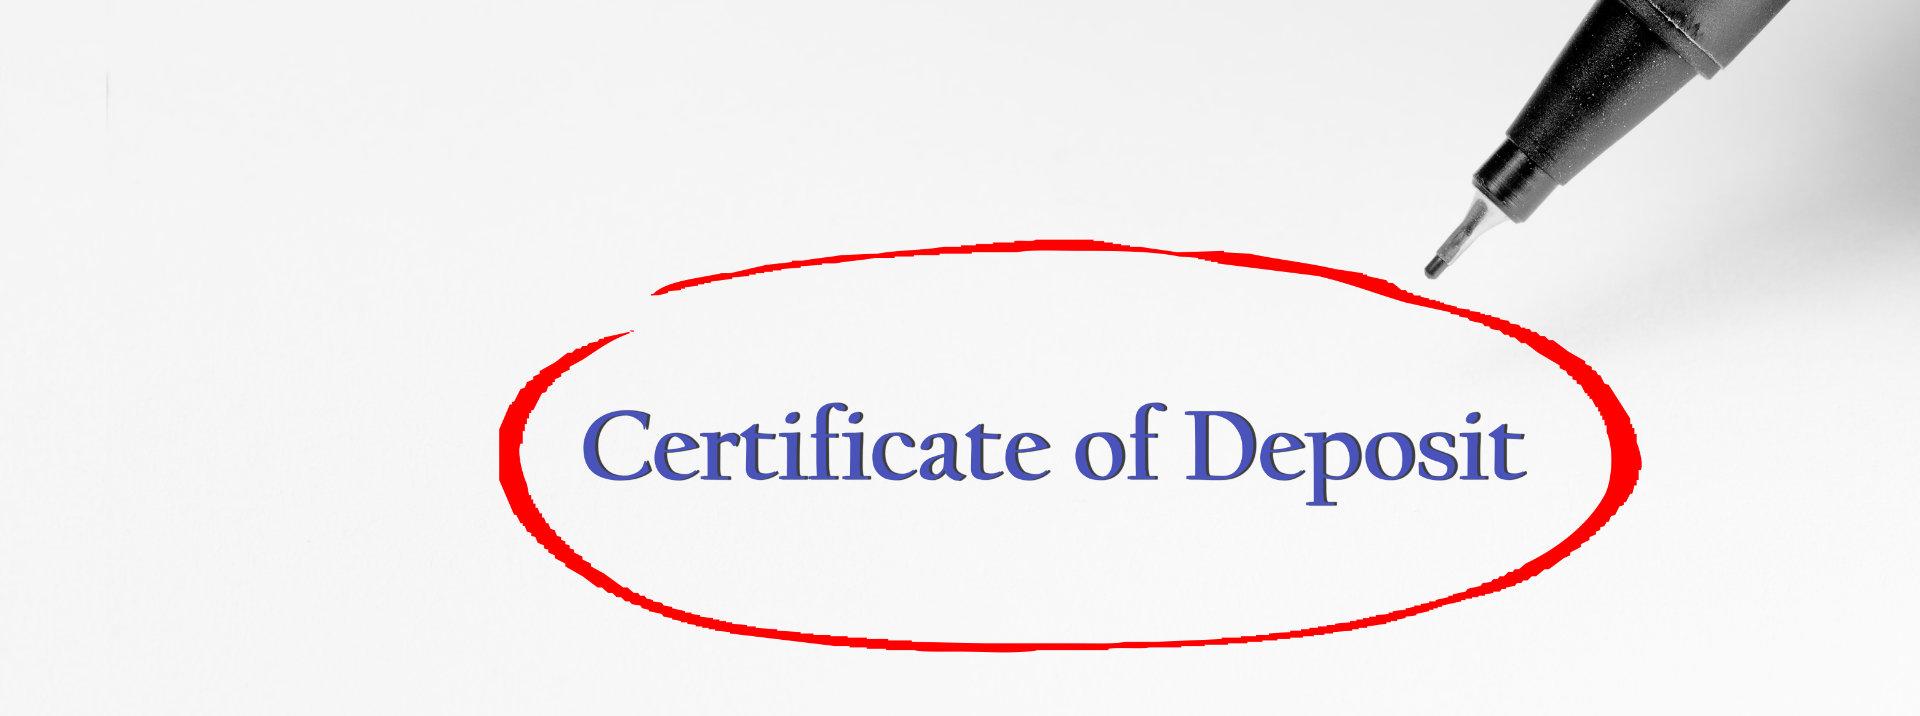 Ozark bank business certificate of deposit business certificate of deposit 1betcityfo Images